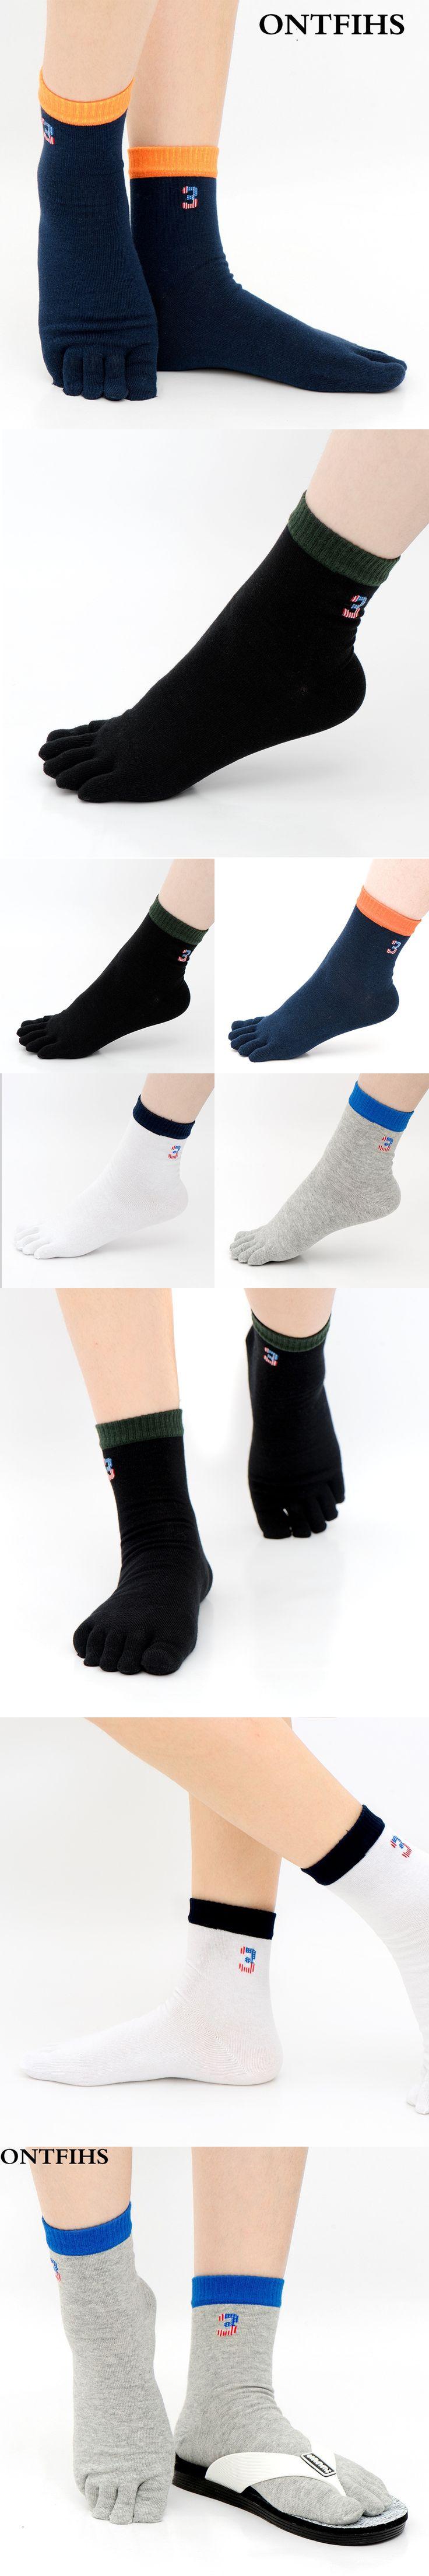 ONTFIHS Fashion Business Men Toe Socks Crew  Combed Cotton Socks for Male  Five Finger Dress Socks Casual